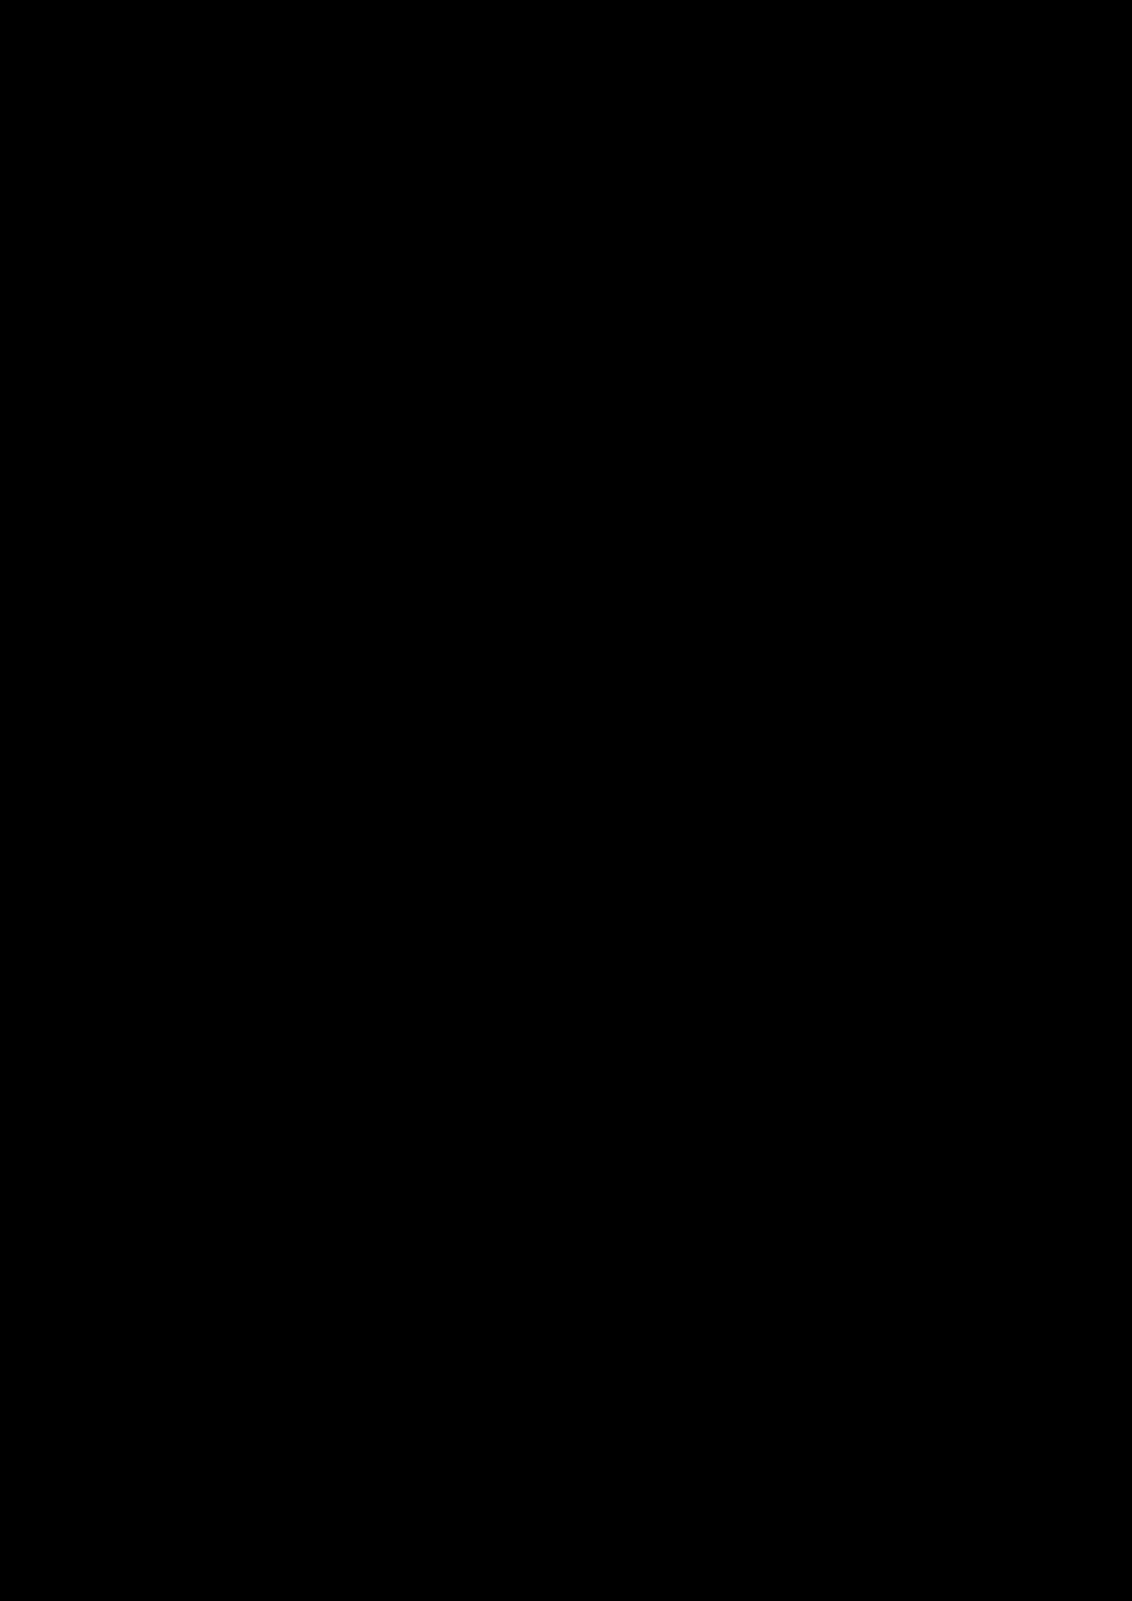 Ispoved Pervogo Boga slide, Image 58